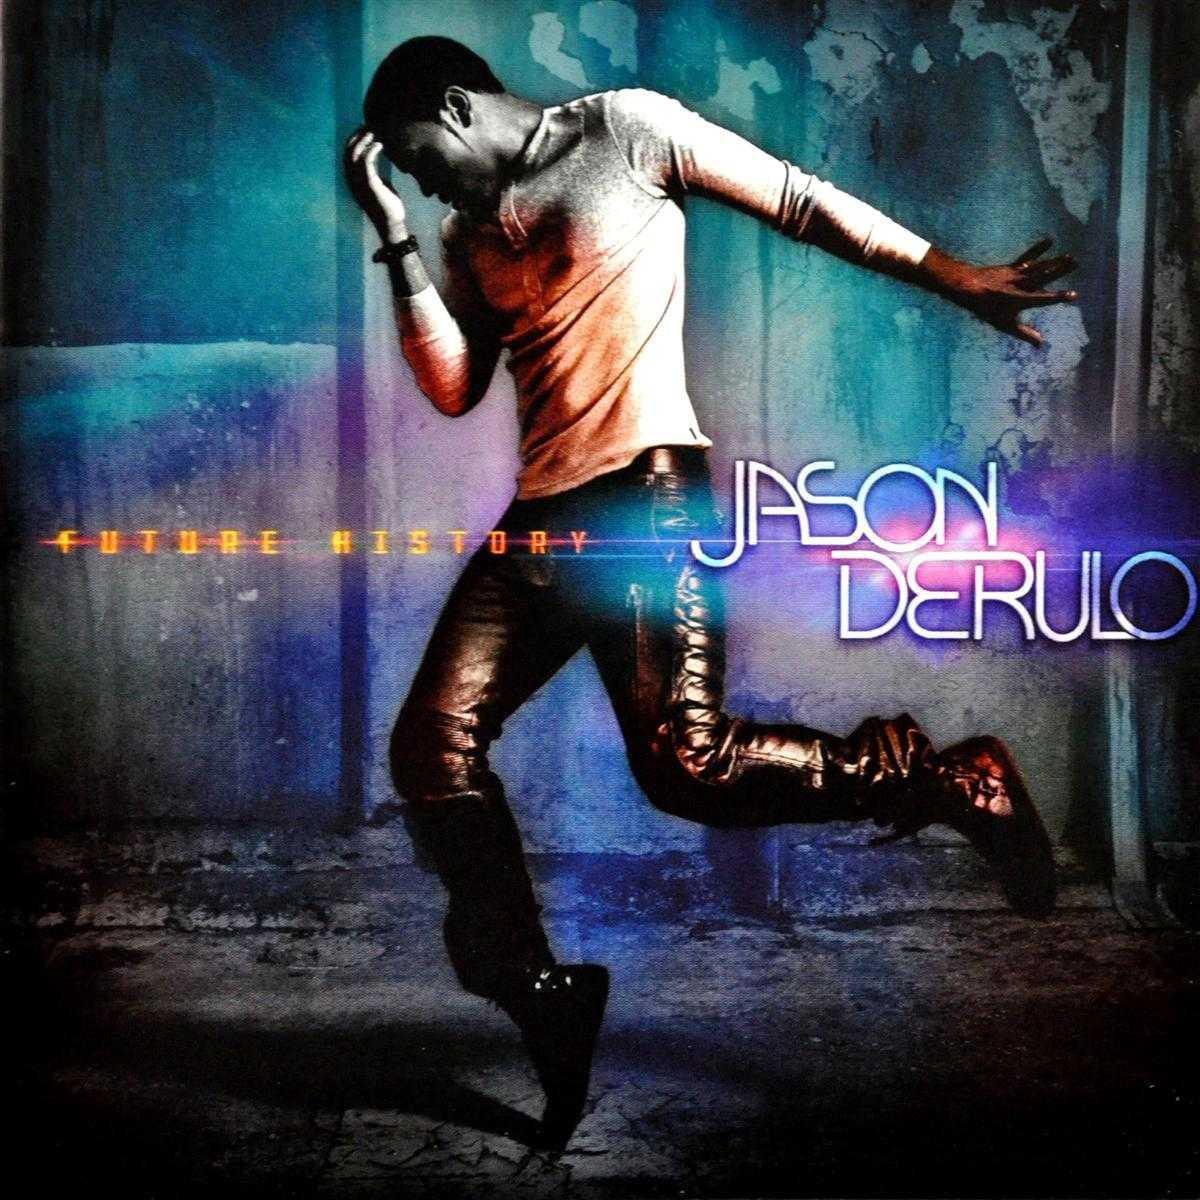 Future History - Jason Derulo